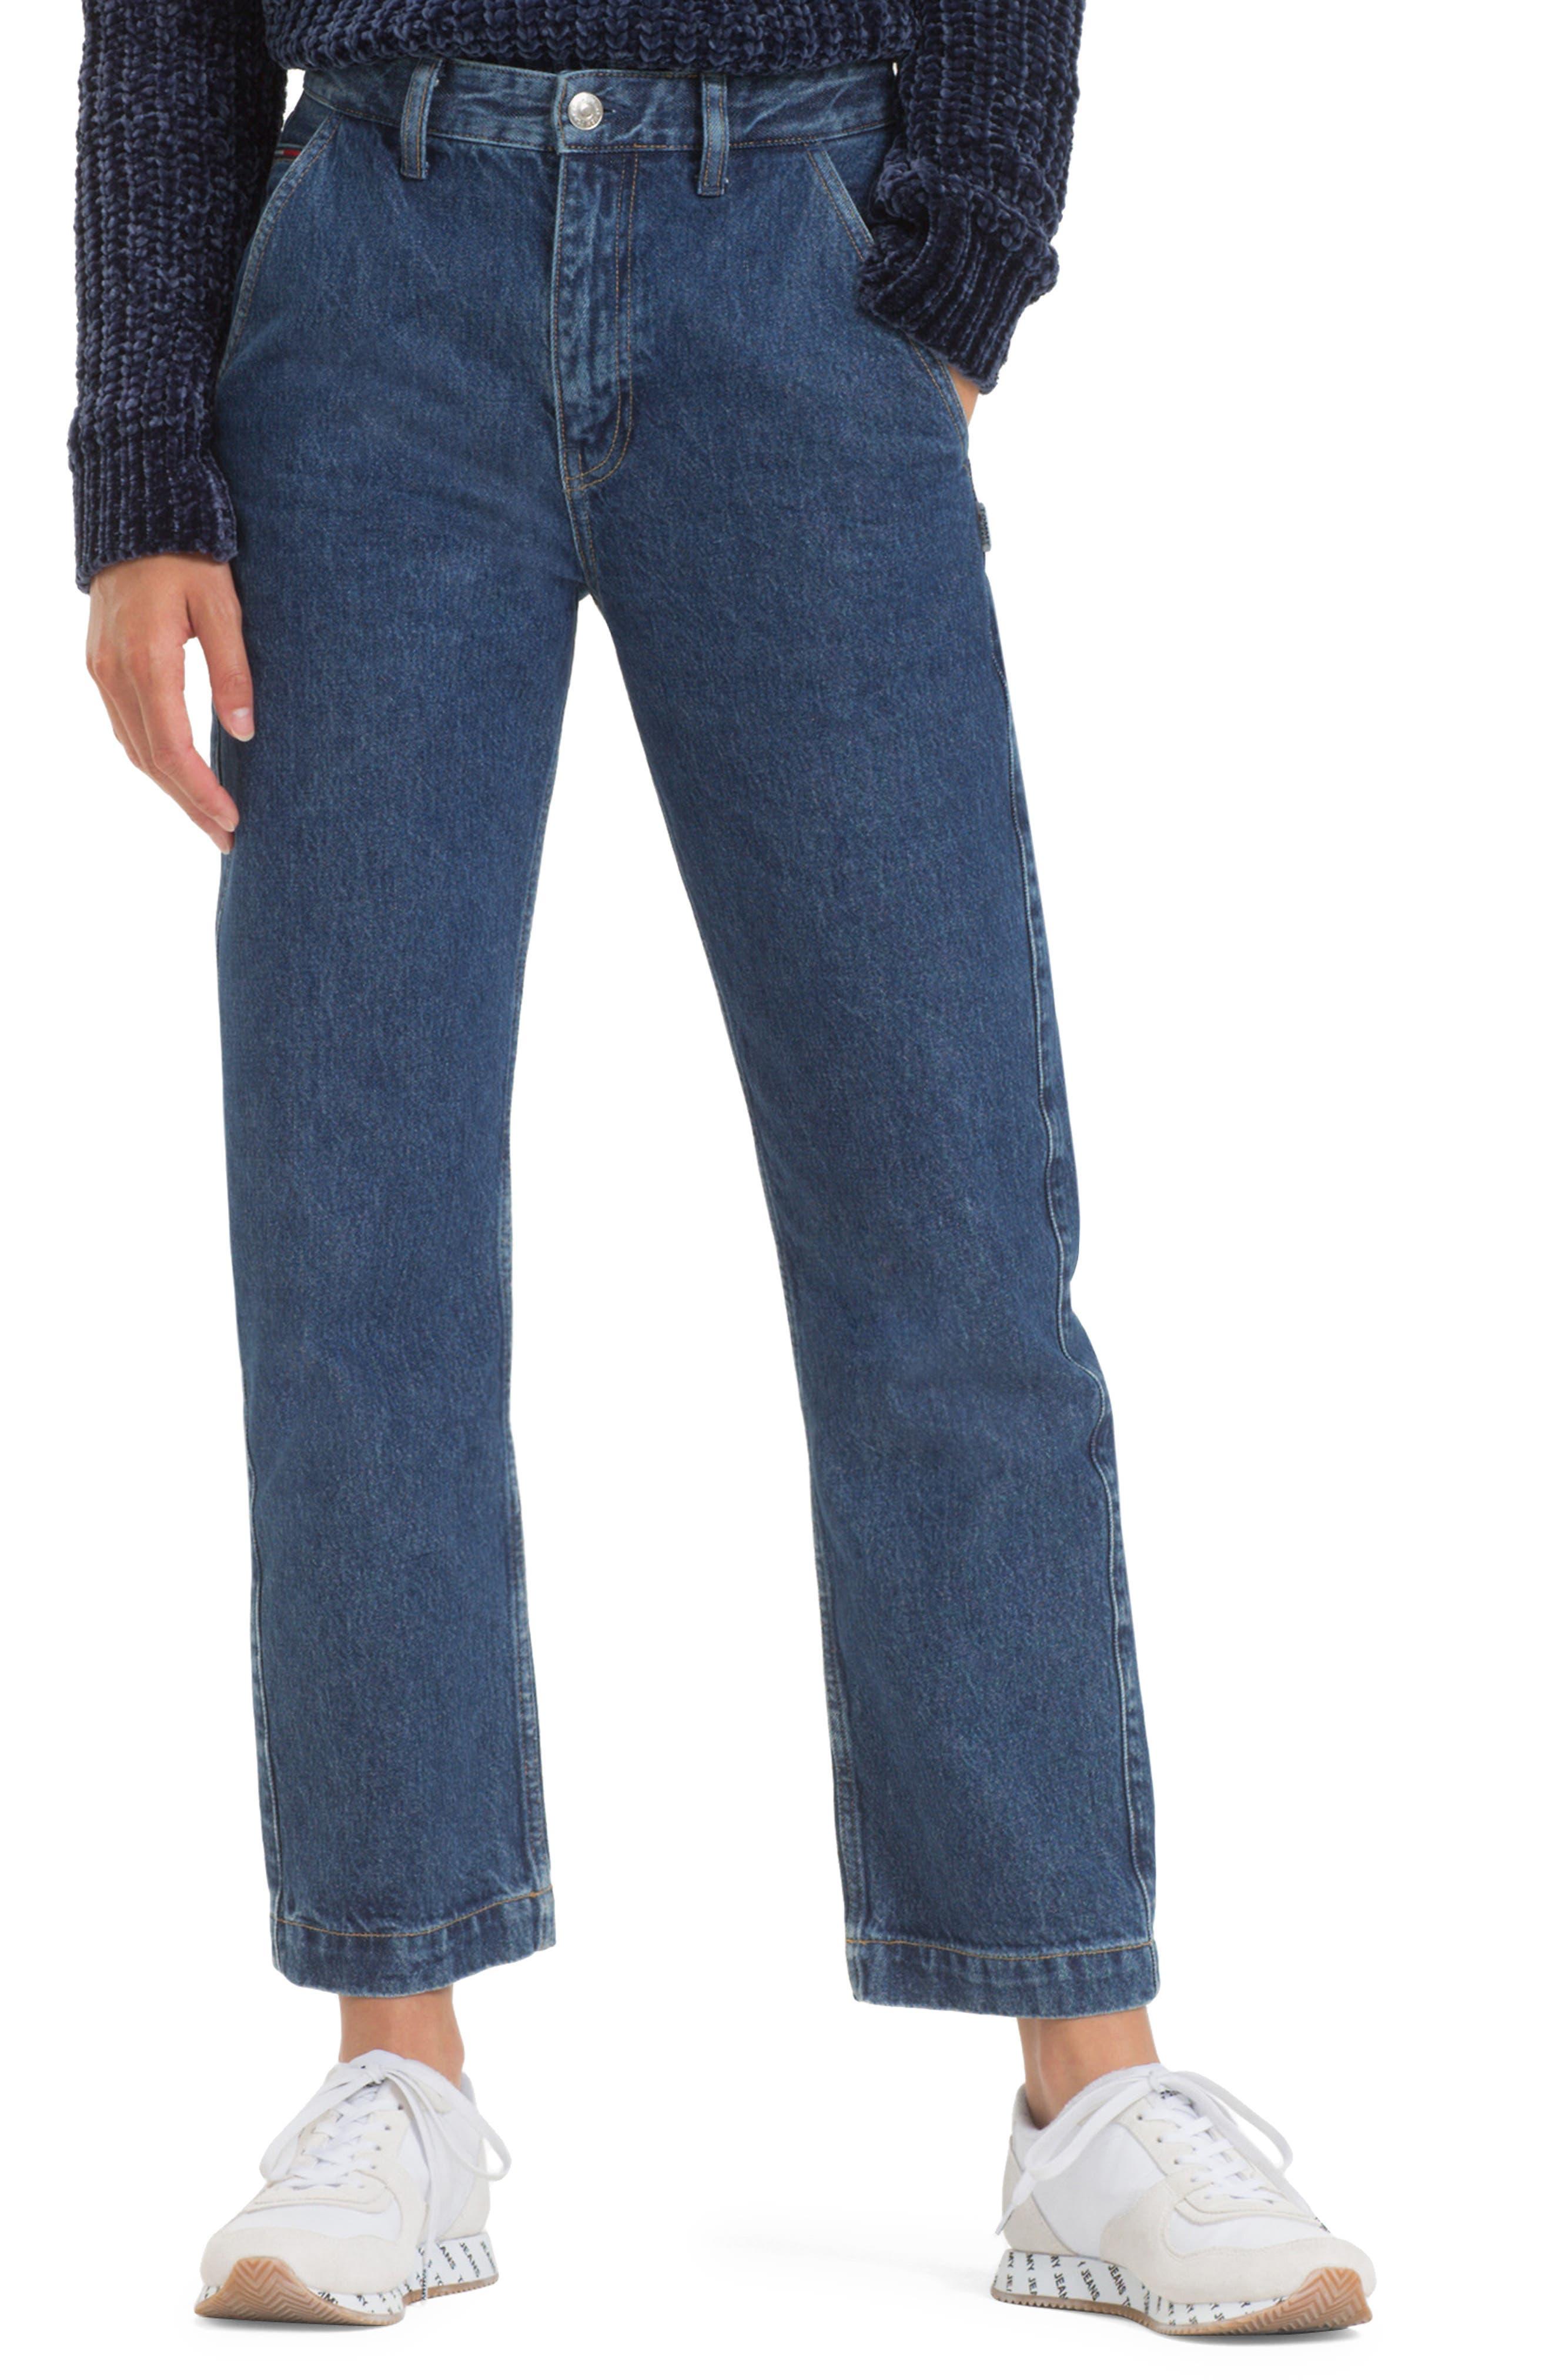 TJW Straight Leg Jeans,                             Main thumbnail 1, color,                             GOUGH MID BLUE RIGID